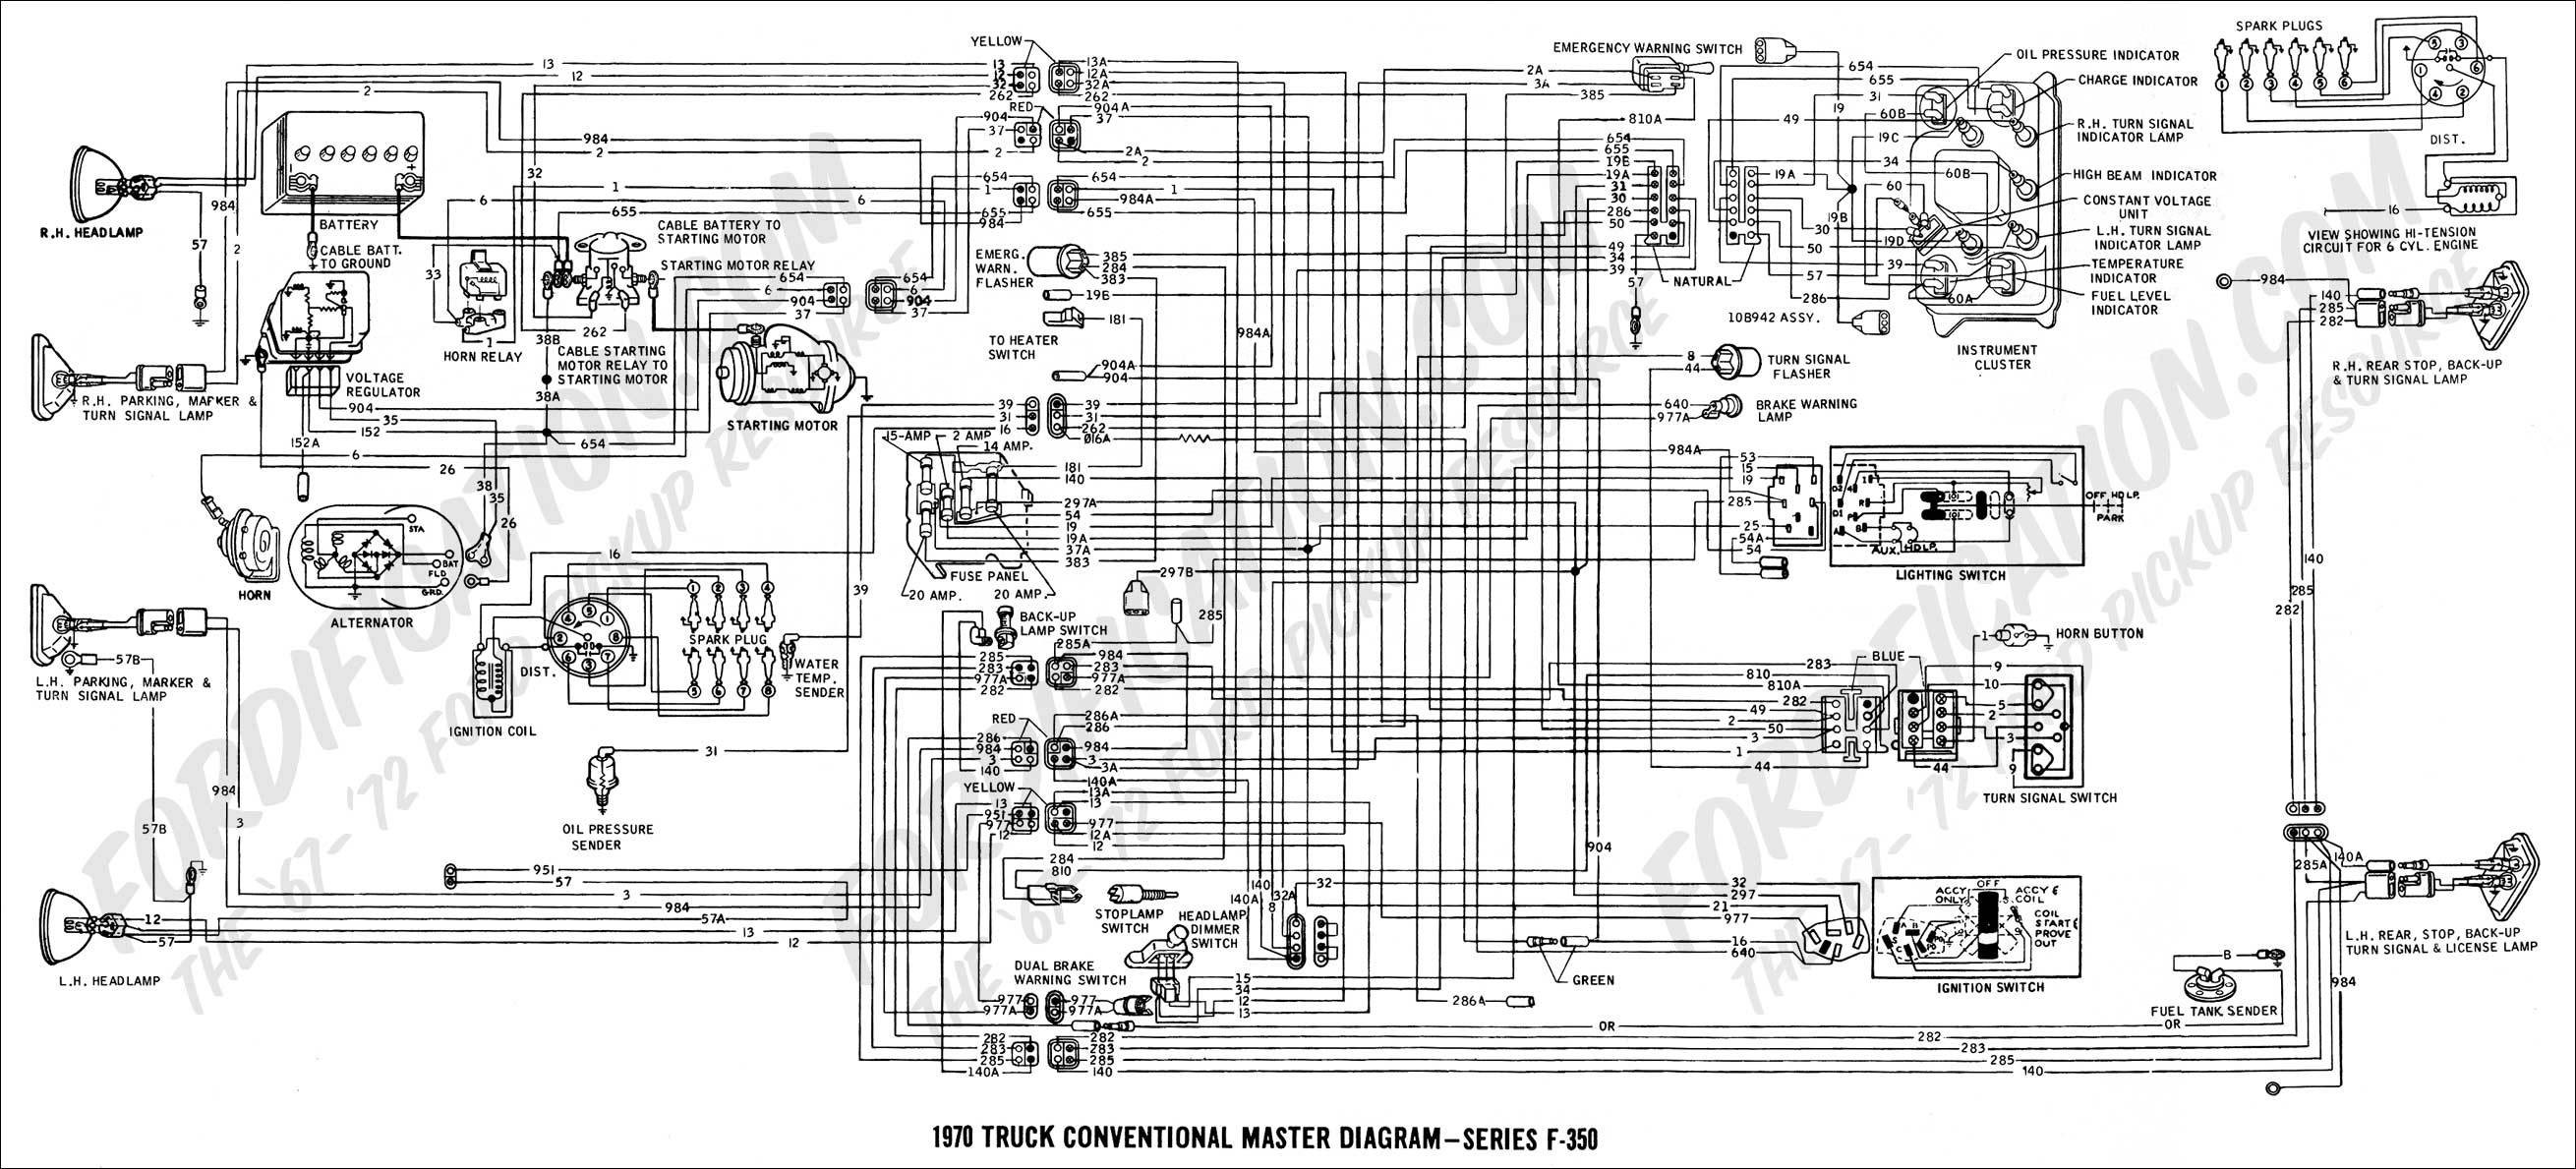 1999 international 4700 wiring diagram house wiring diagram symbols \u2022  1999 international 4700 wiring diagram inspirational wiring rh mainetreasurechest com 1999 international truck 4700 wiring diagram